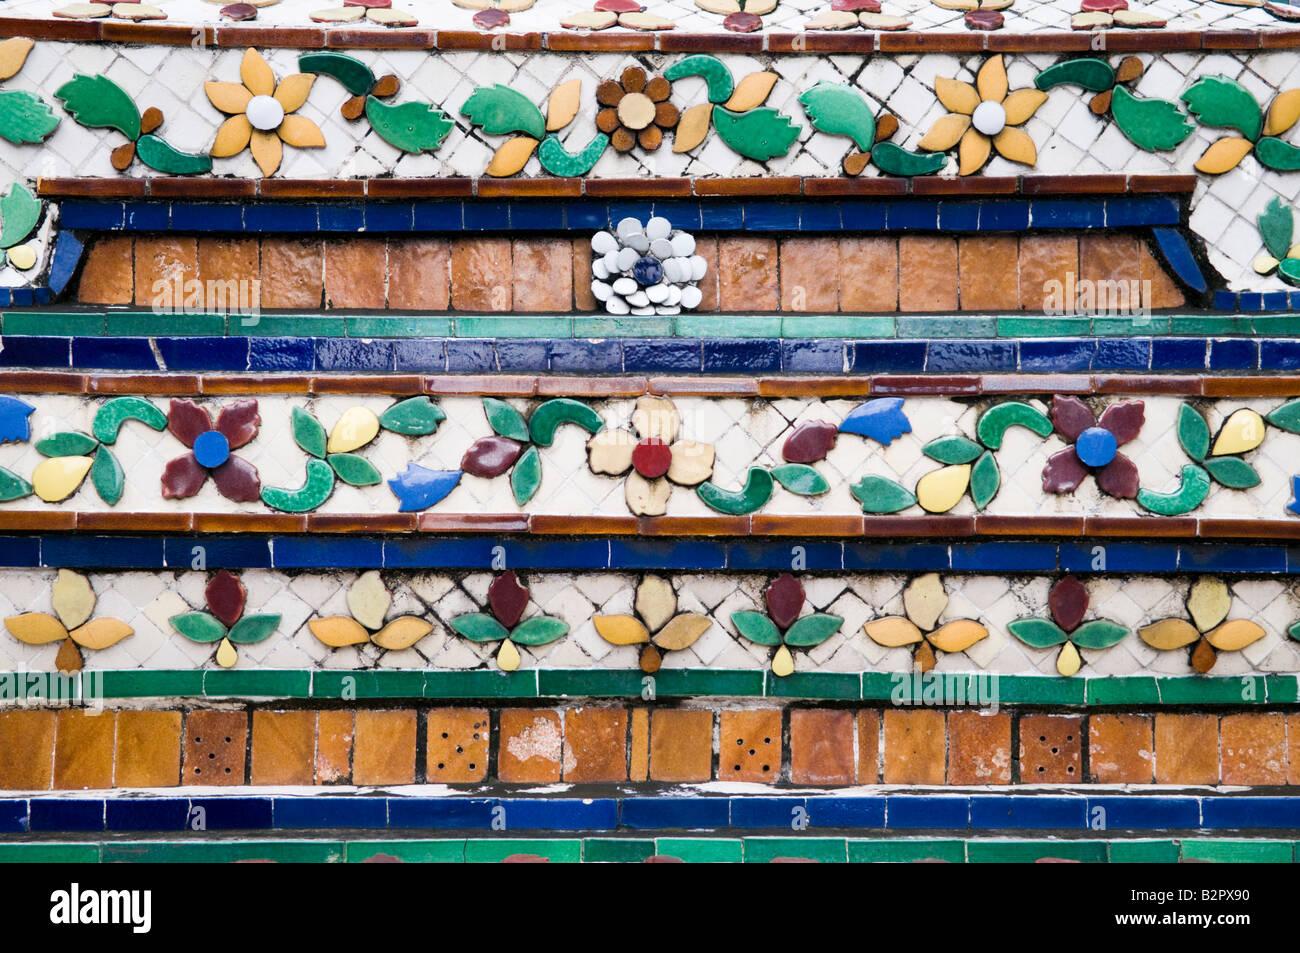 Decorative  tiles at Wat Pho in Bangkok - Stock Image